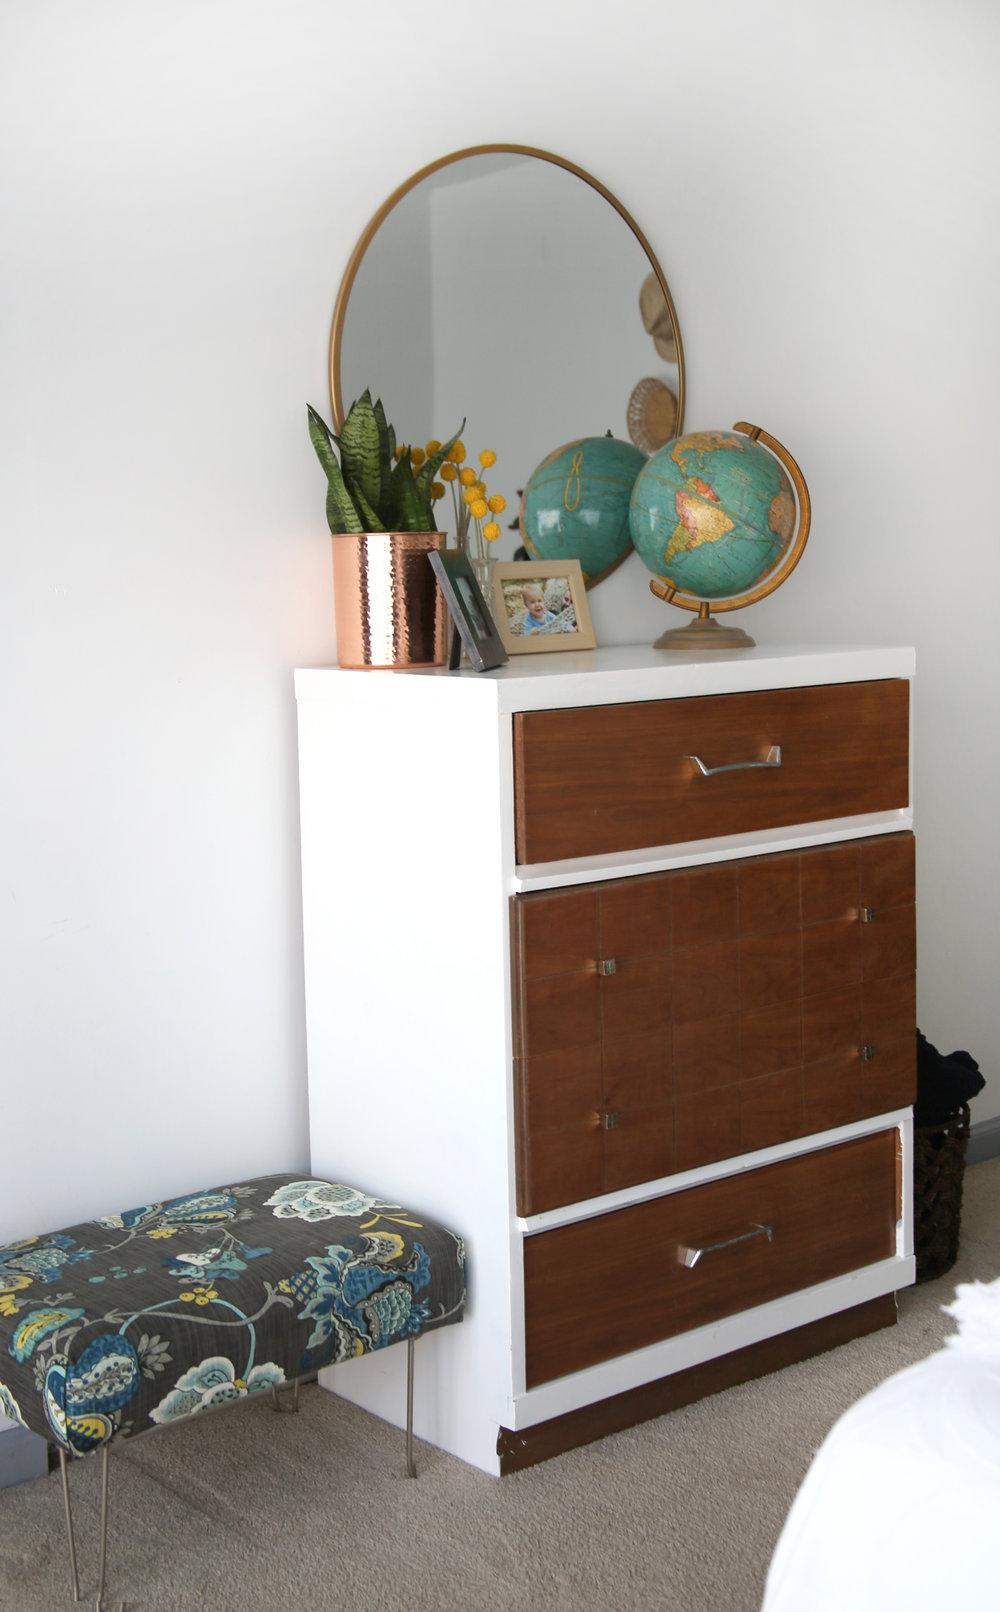 MCM Dresser with Globe and Round Mirror